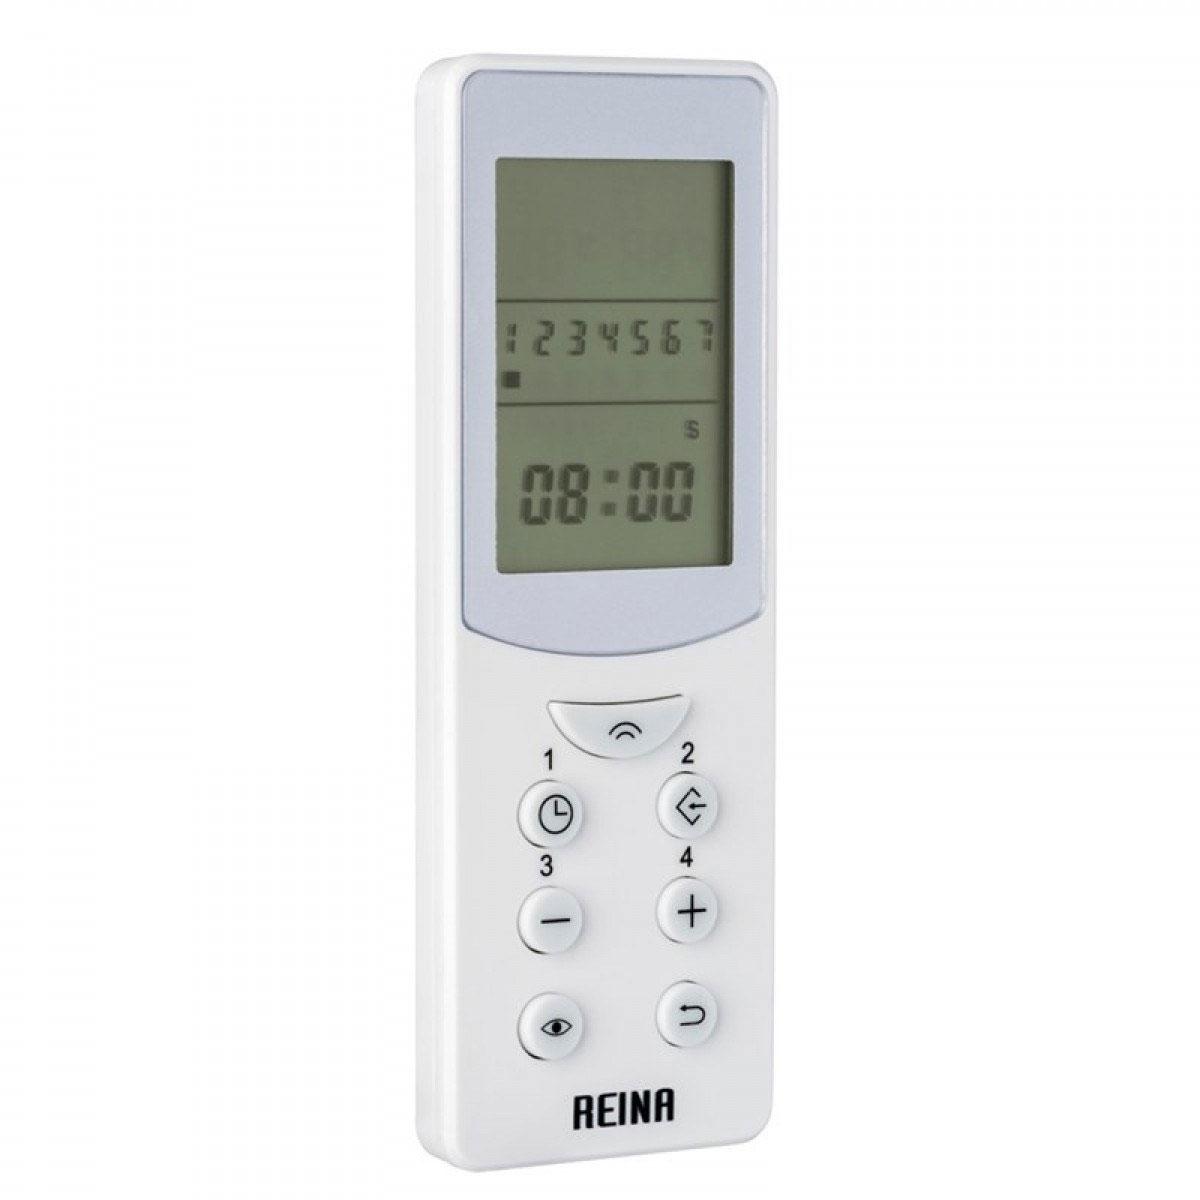 Reina Diva Thermostatic Electric Straight Heated Towel Rail 1000mm H x 600mm W Chrome